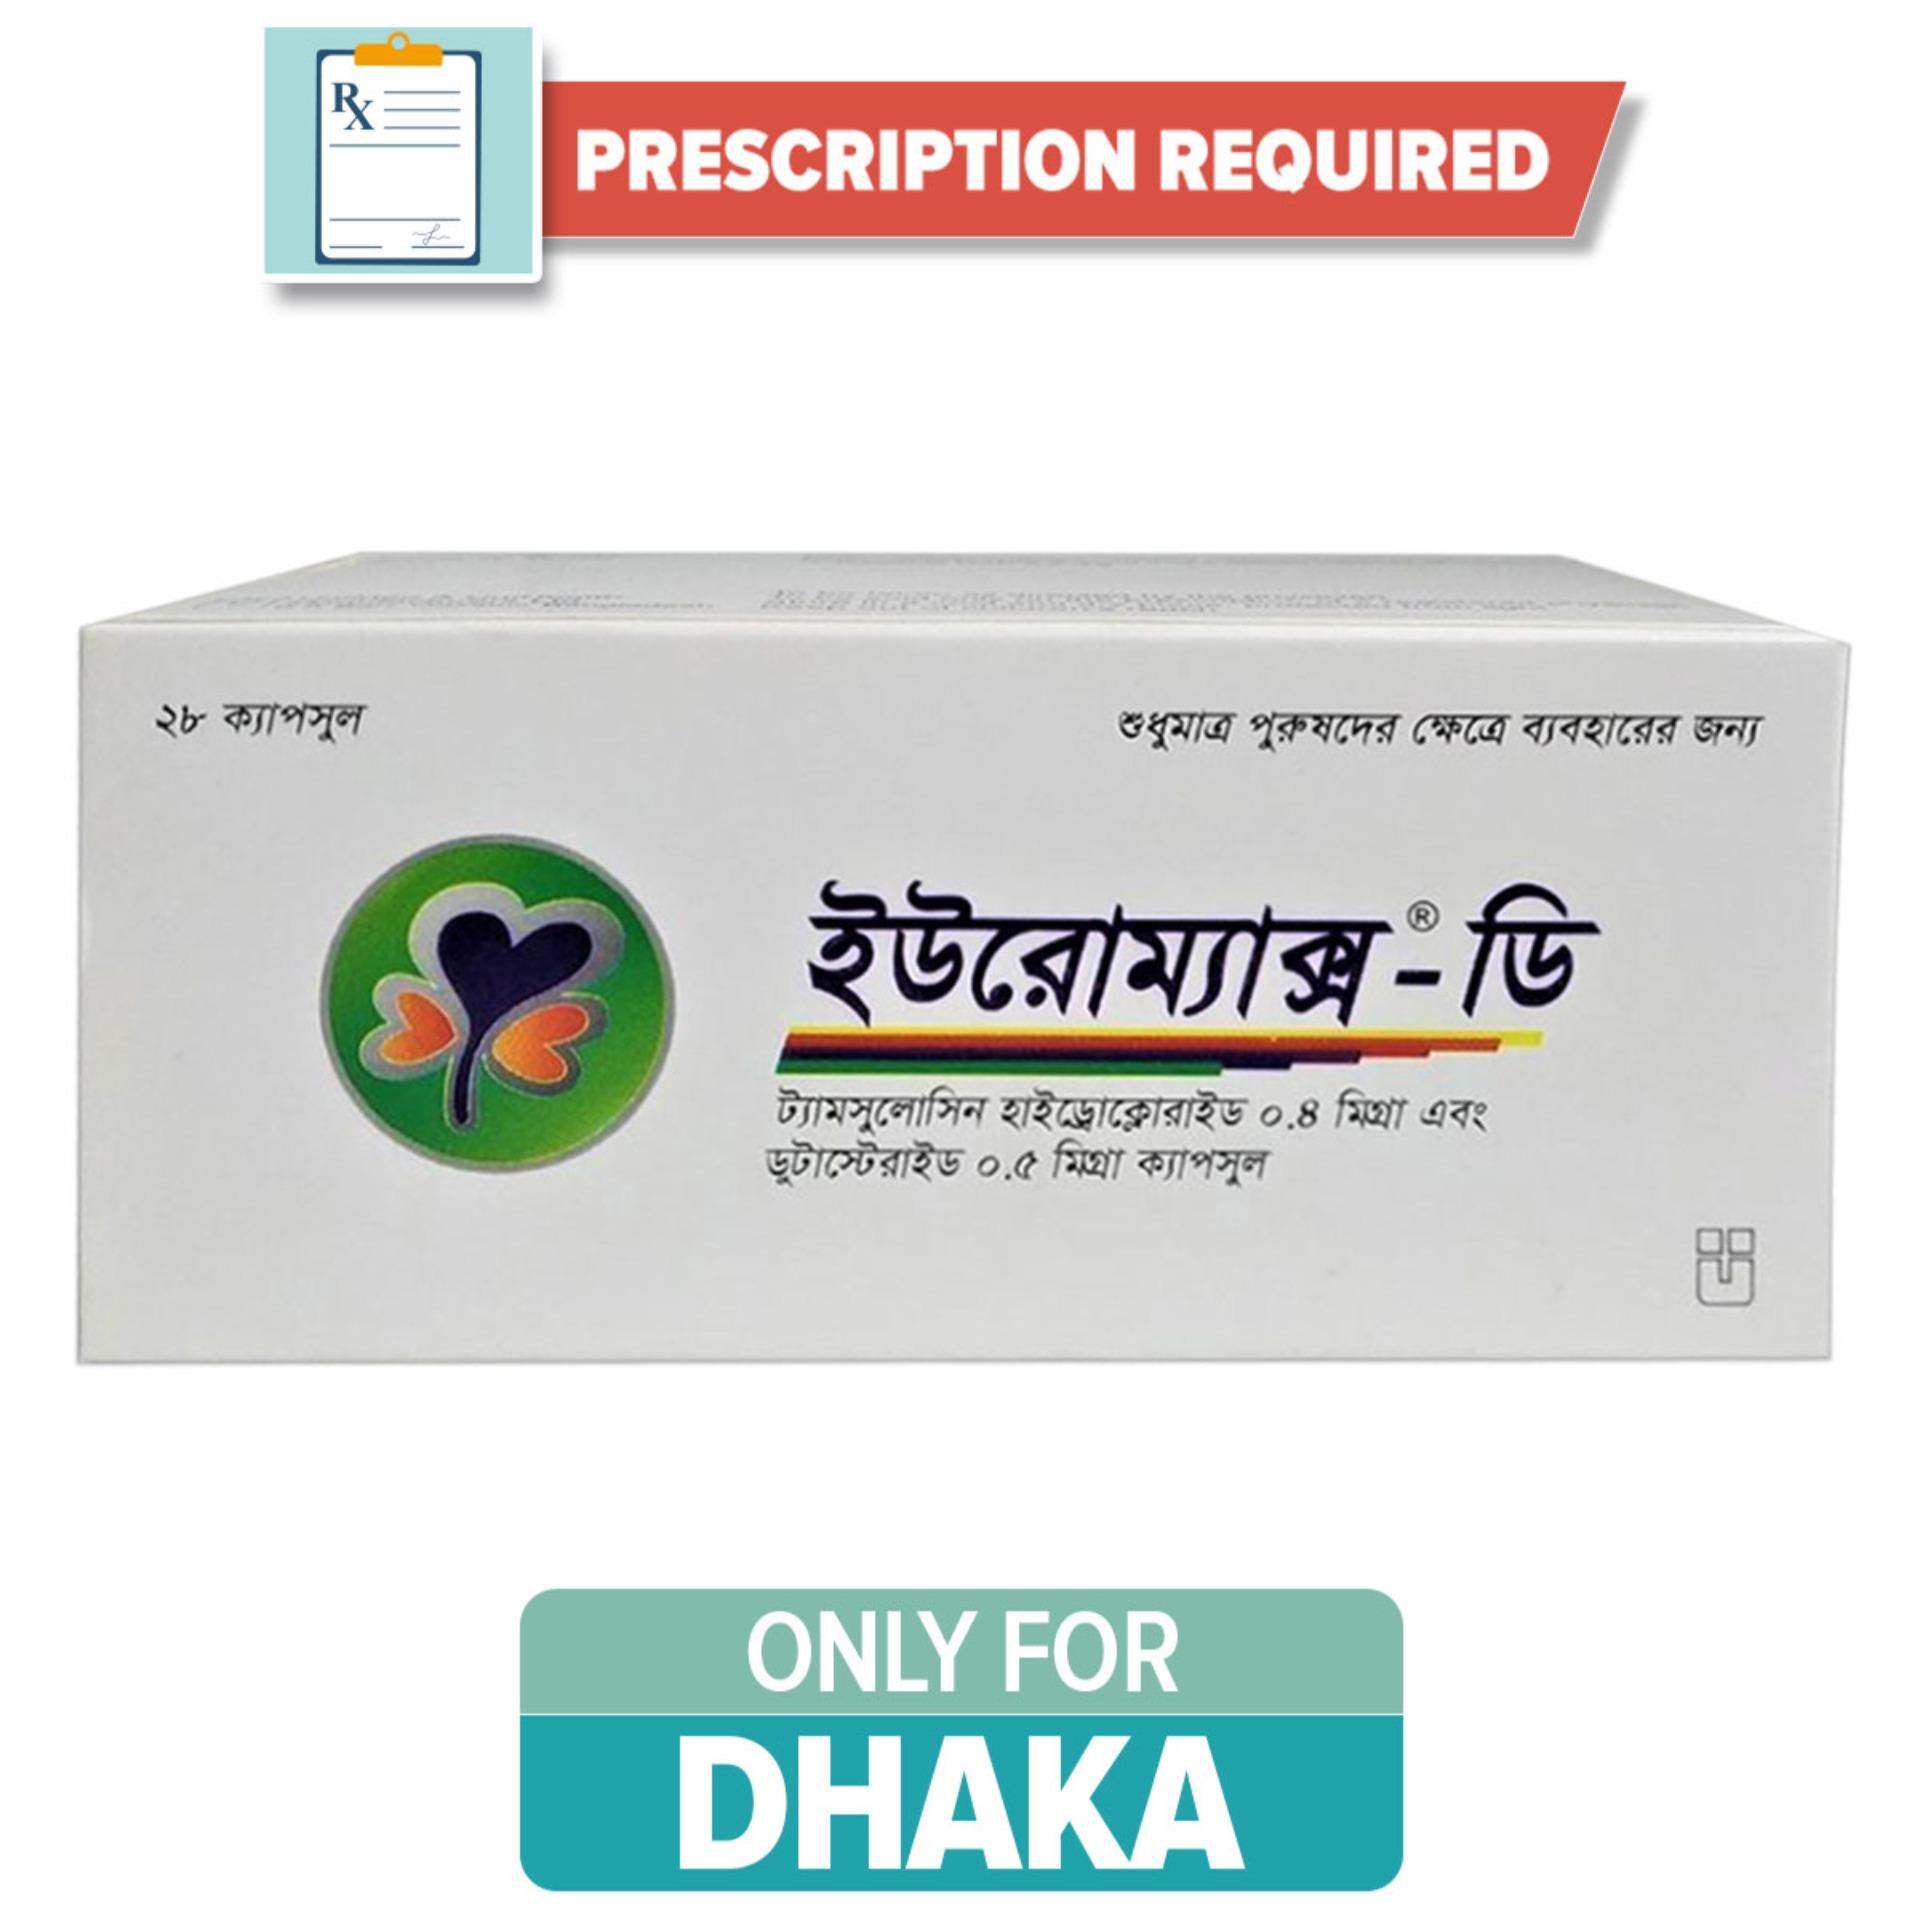 Uromax D Capsule 1 Strip Tamsulosin Hcl 0 4mg Dutasteride Inn 0 5mg Buy Online At Best Prices In Bangladesh Daraz Com Bd